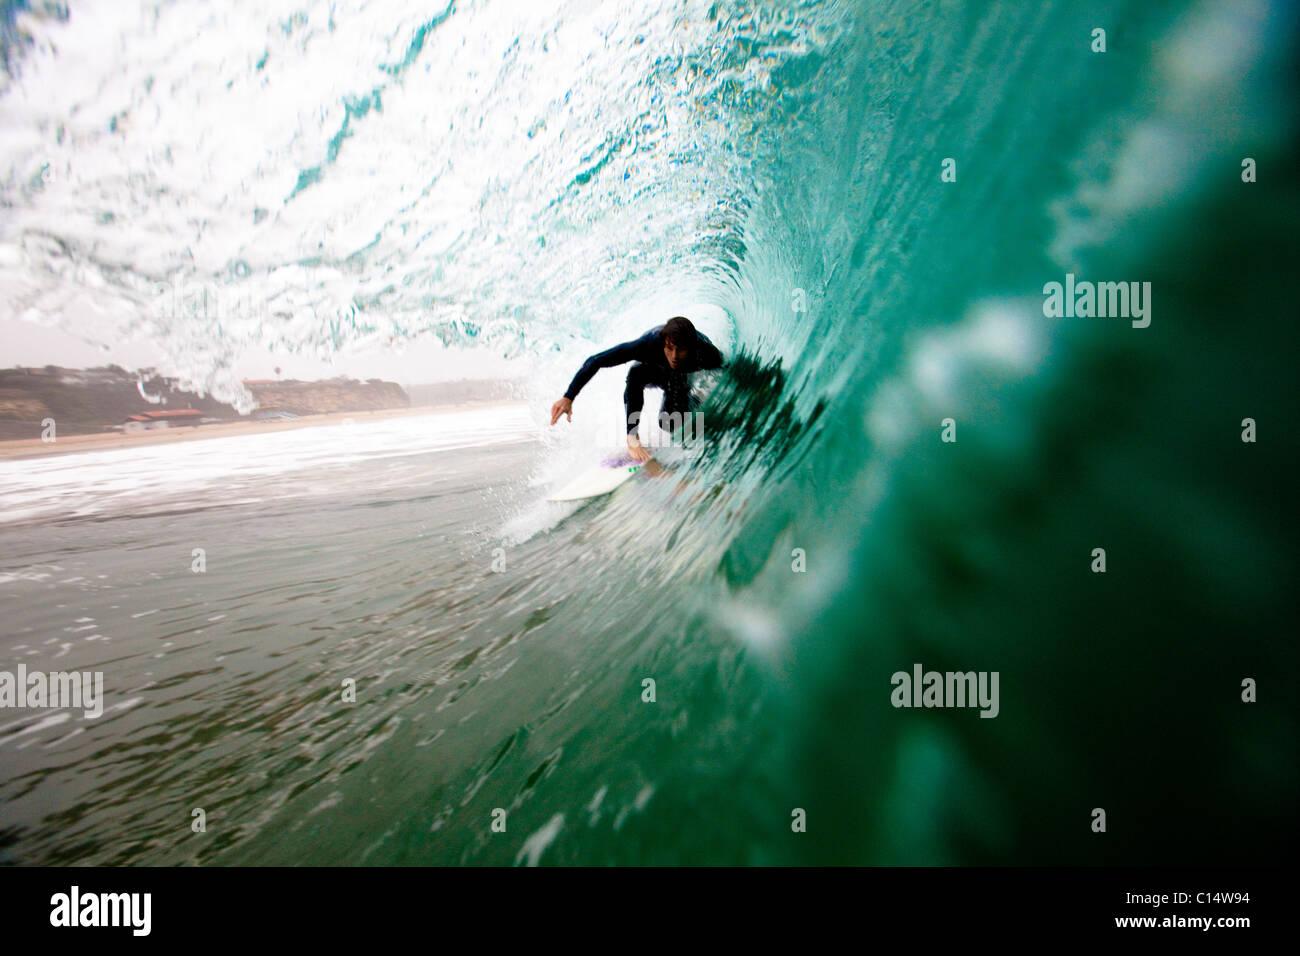 A male surfer pulls into a barrel while surfing at Zuma beach in Malibu, California. - Stock Image